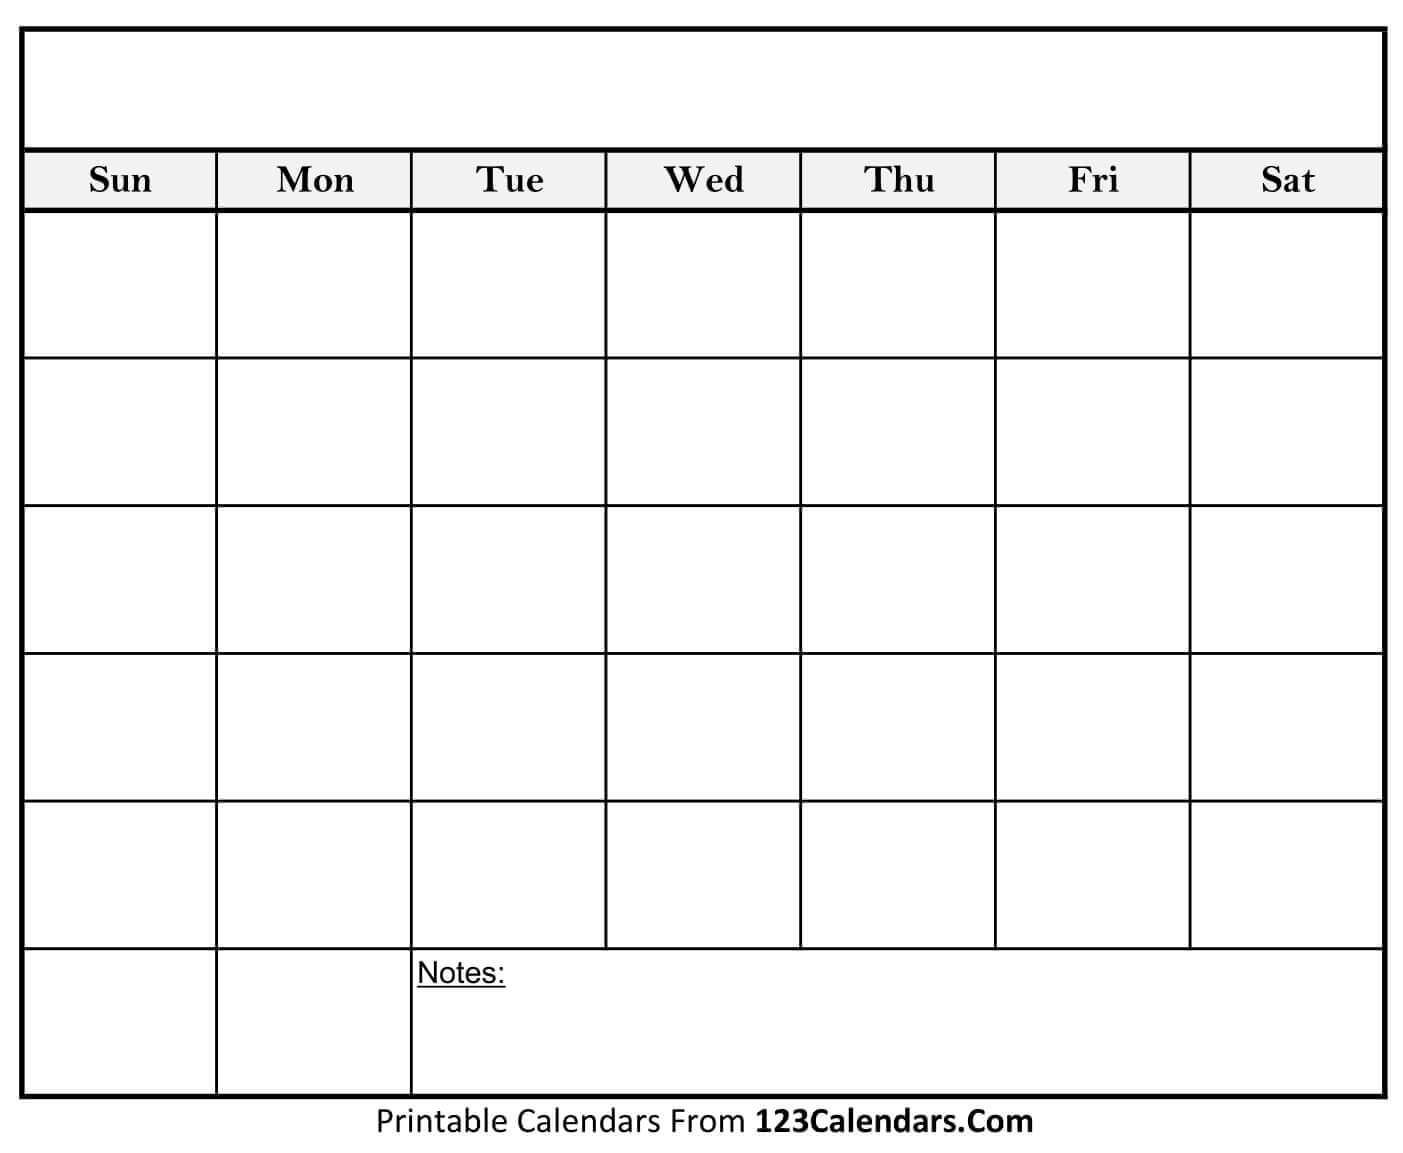 Free Printable Blank Calendar | 123Calendars inside Full Page Blank Calendar Template